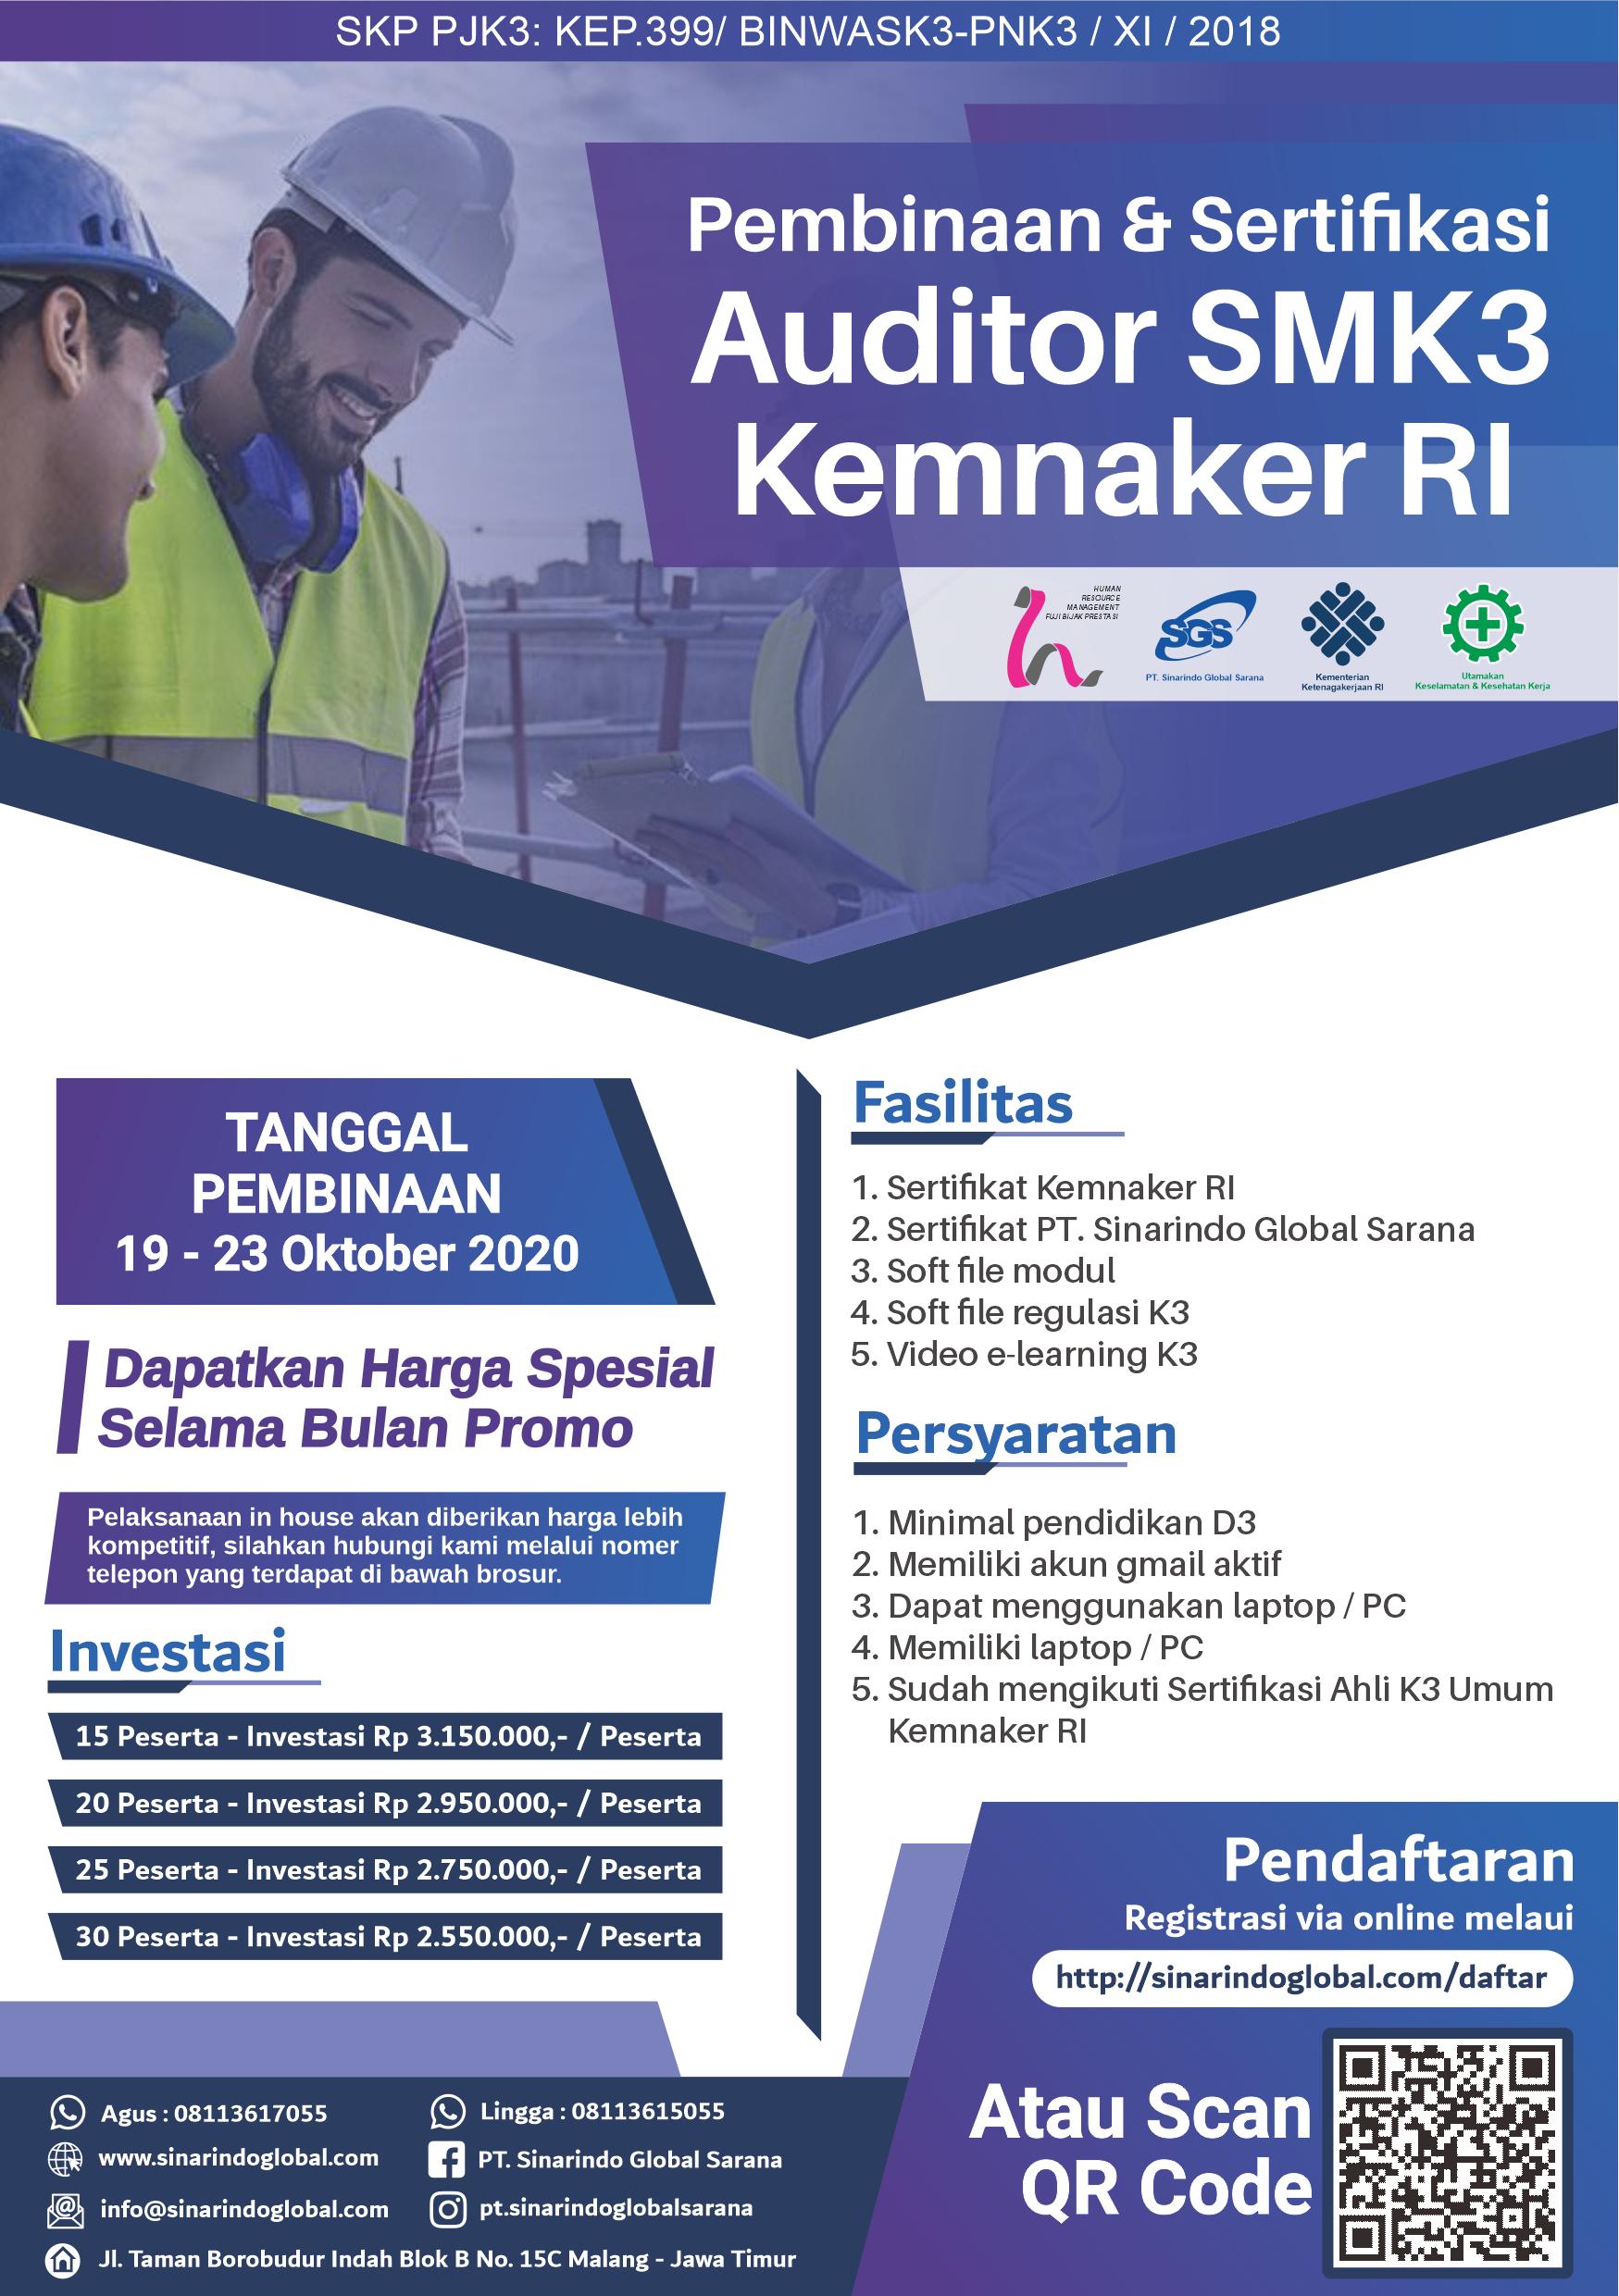 Pembinaan & Sertifikasi Auditor SMK3Sertifikat Kemnaker RI ( 21 - 27 Oktober2020 )